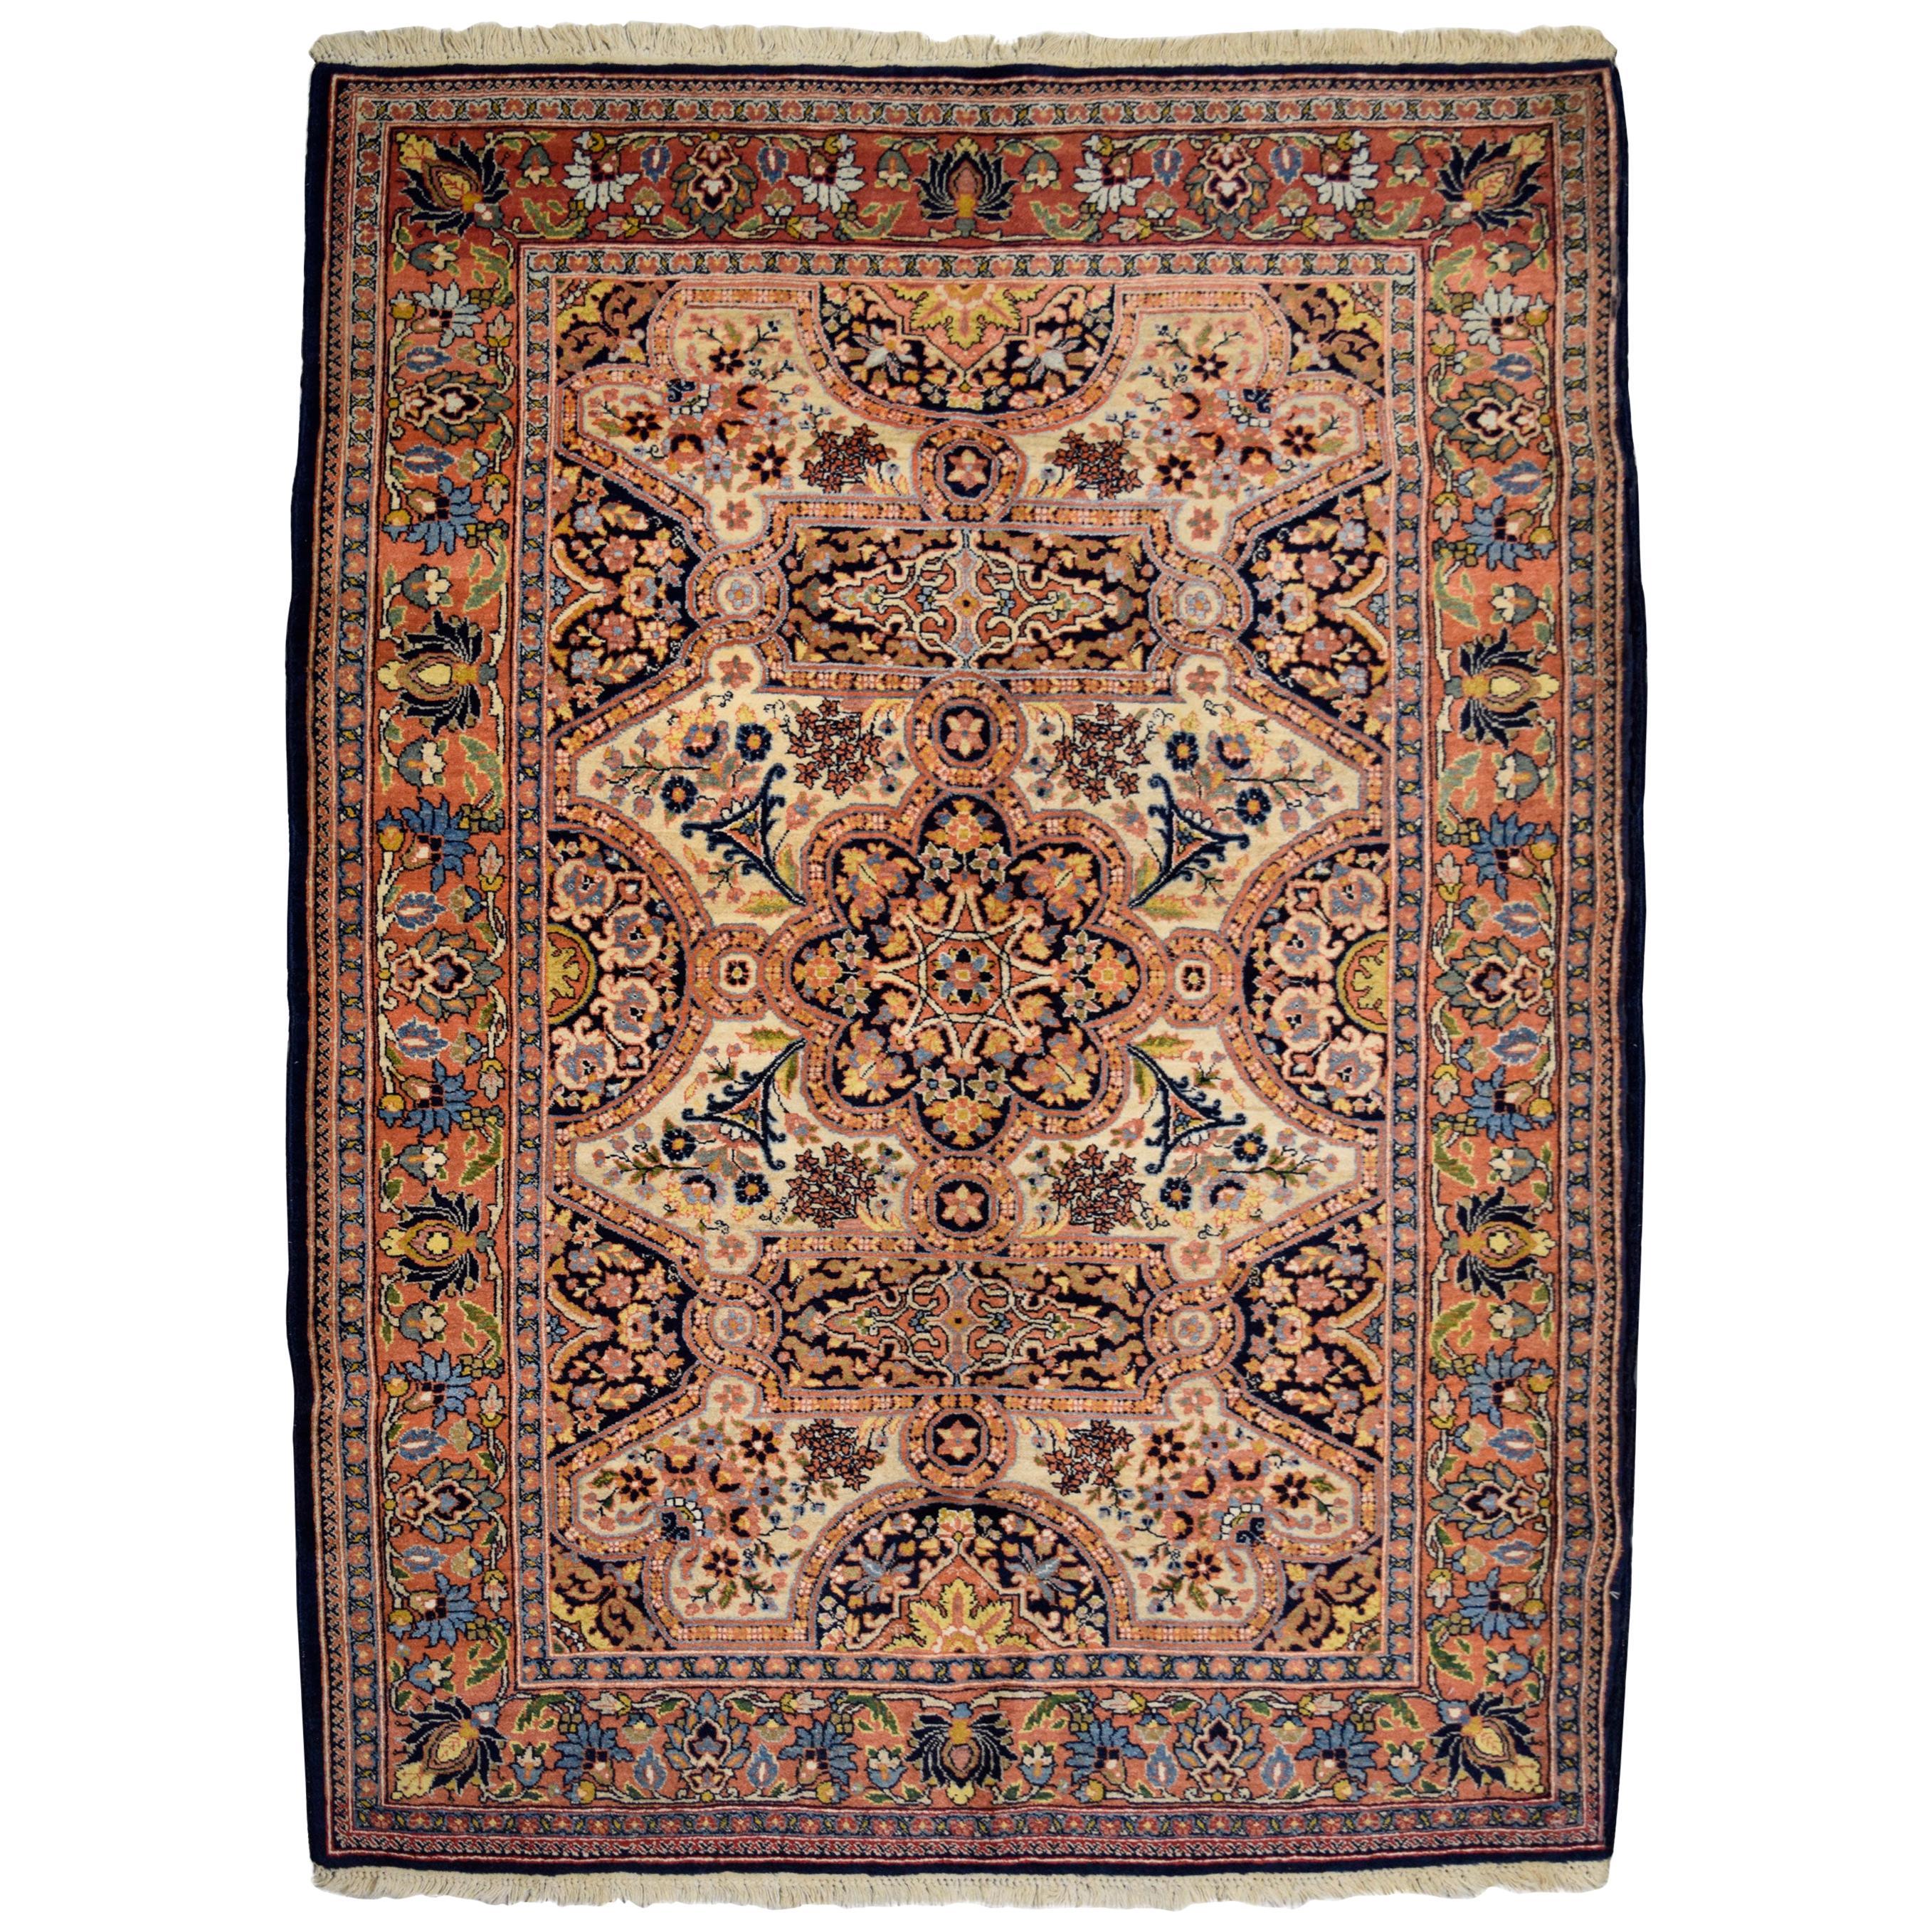 Antique Persian Semnan Carpet in Cream, Black, and Pink Wool